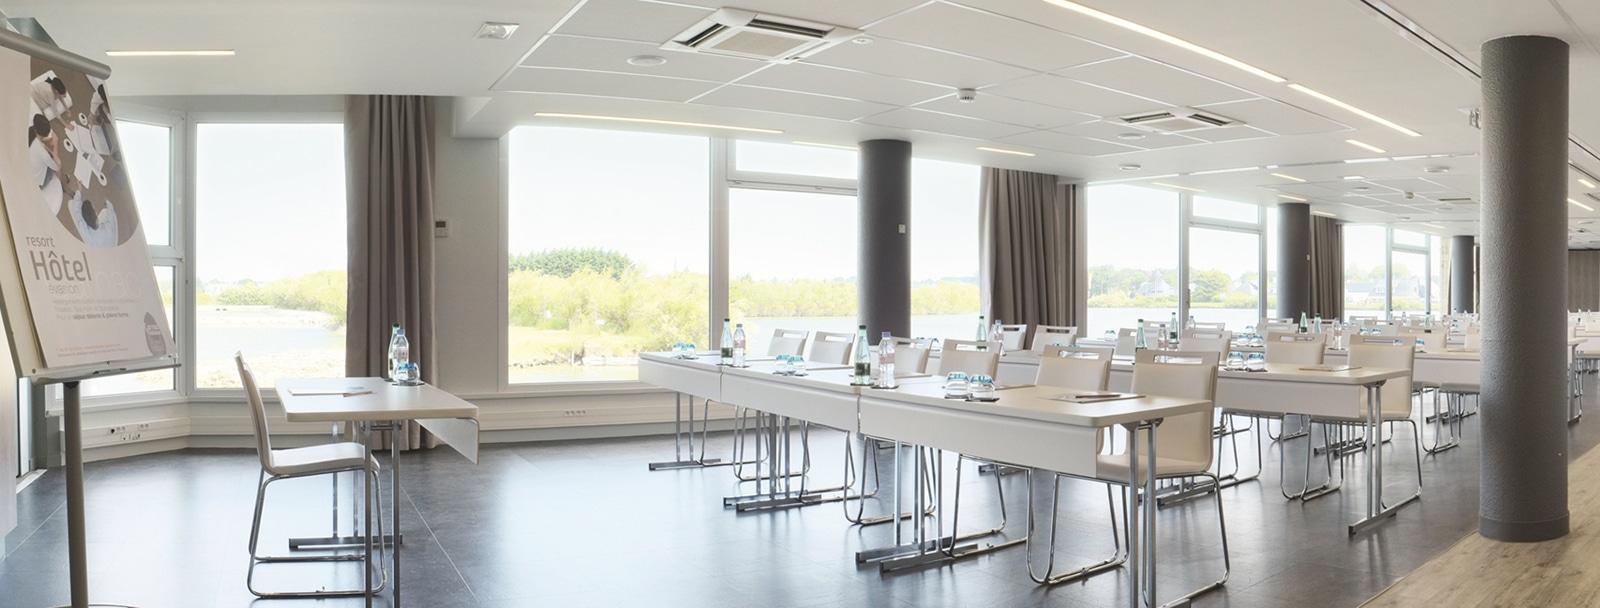 Conference room at the Hôtel Thalazur les Salines at Carnac